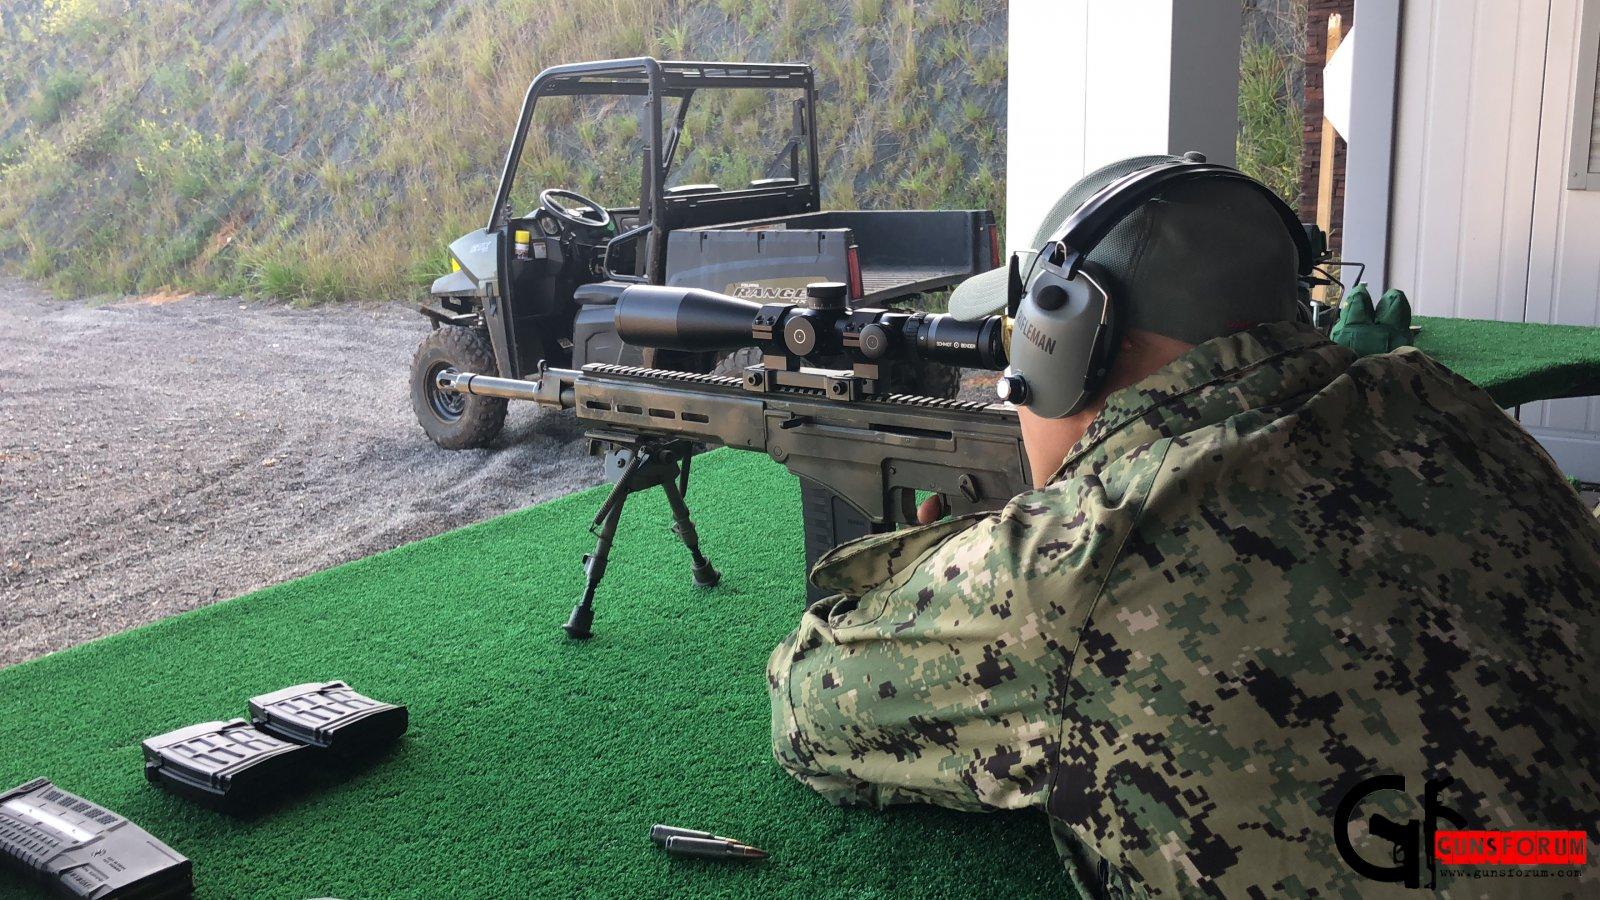 Снайперская винтовка Чукавина (СВЧ)